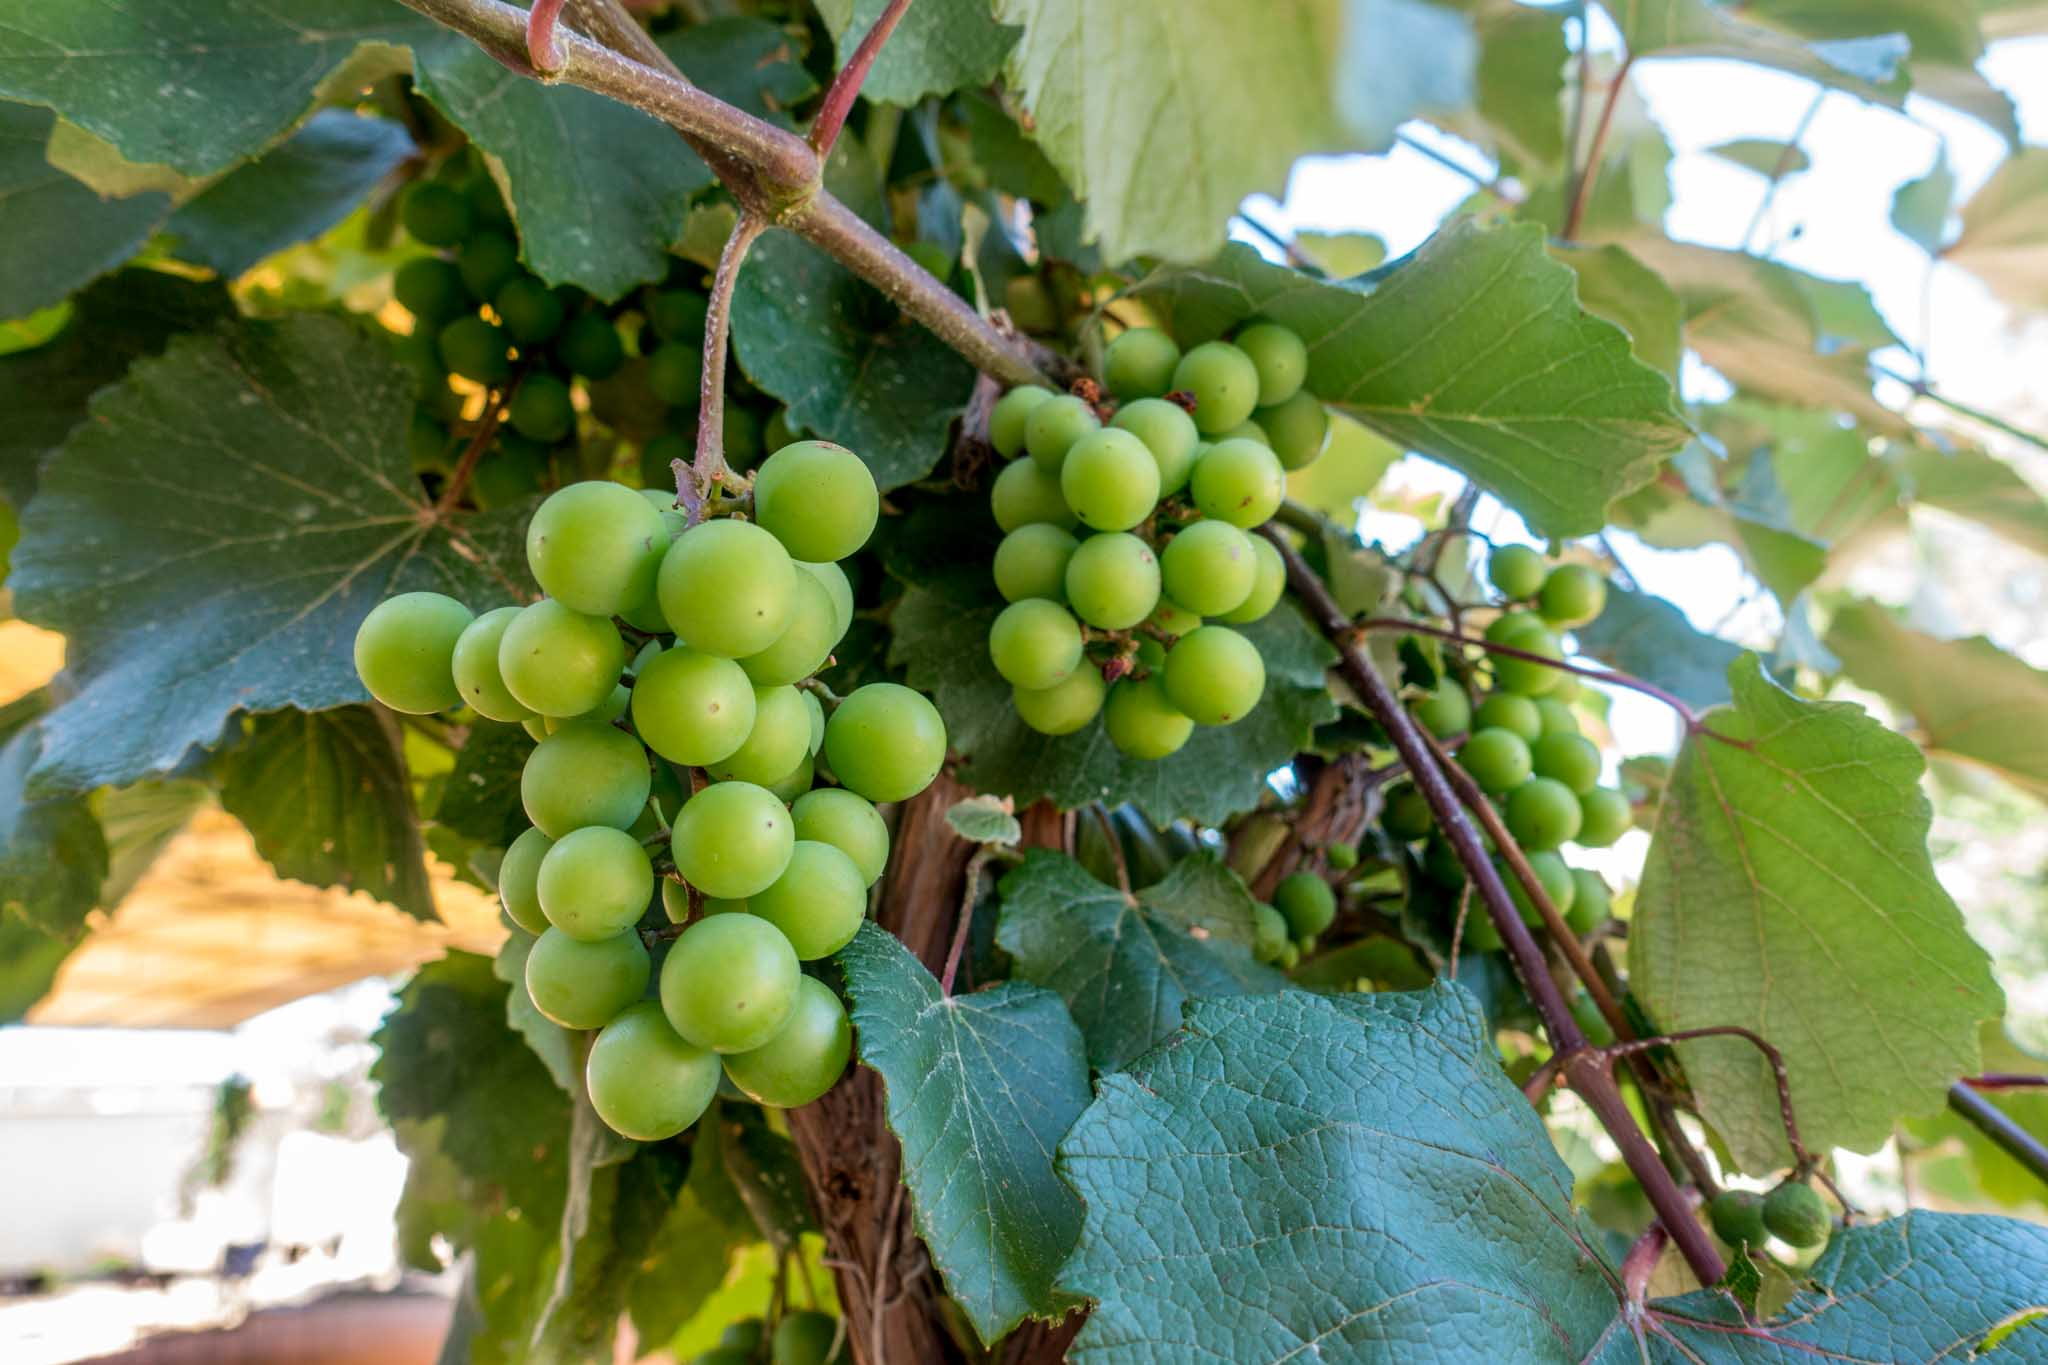 Black Spanish grapes growing